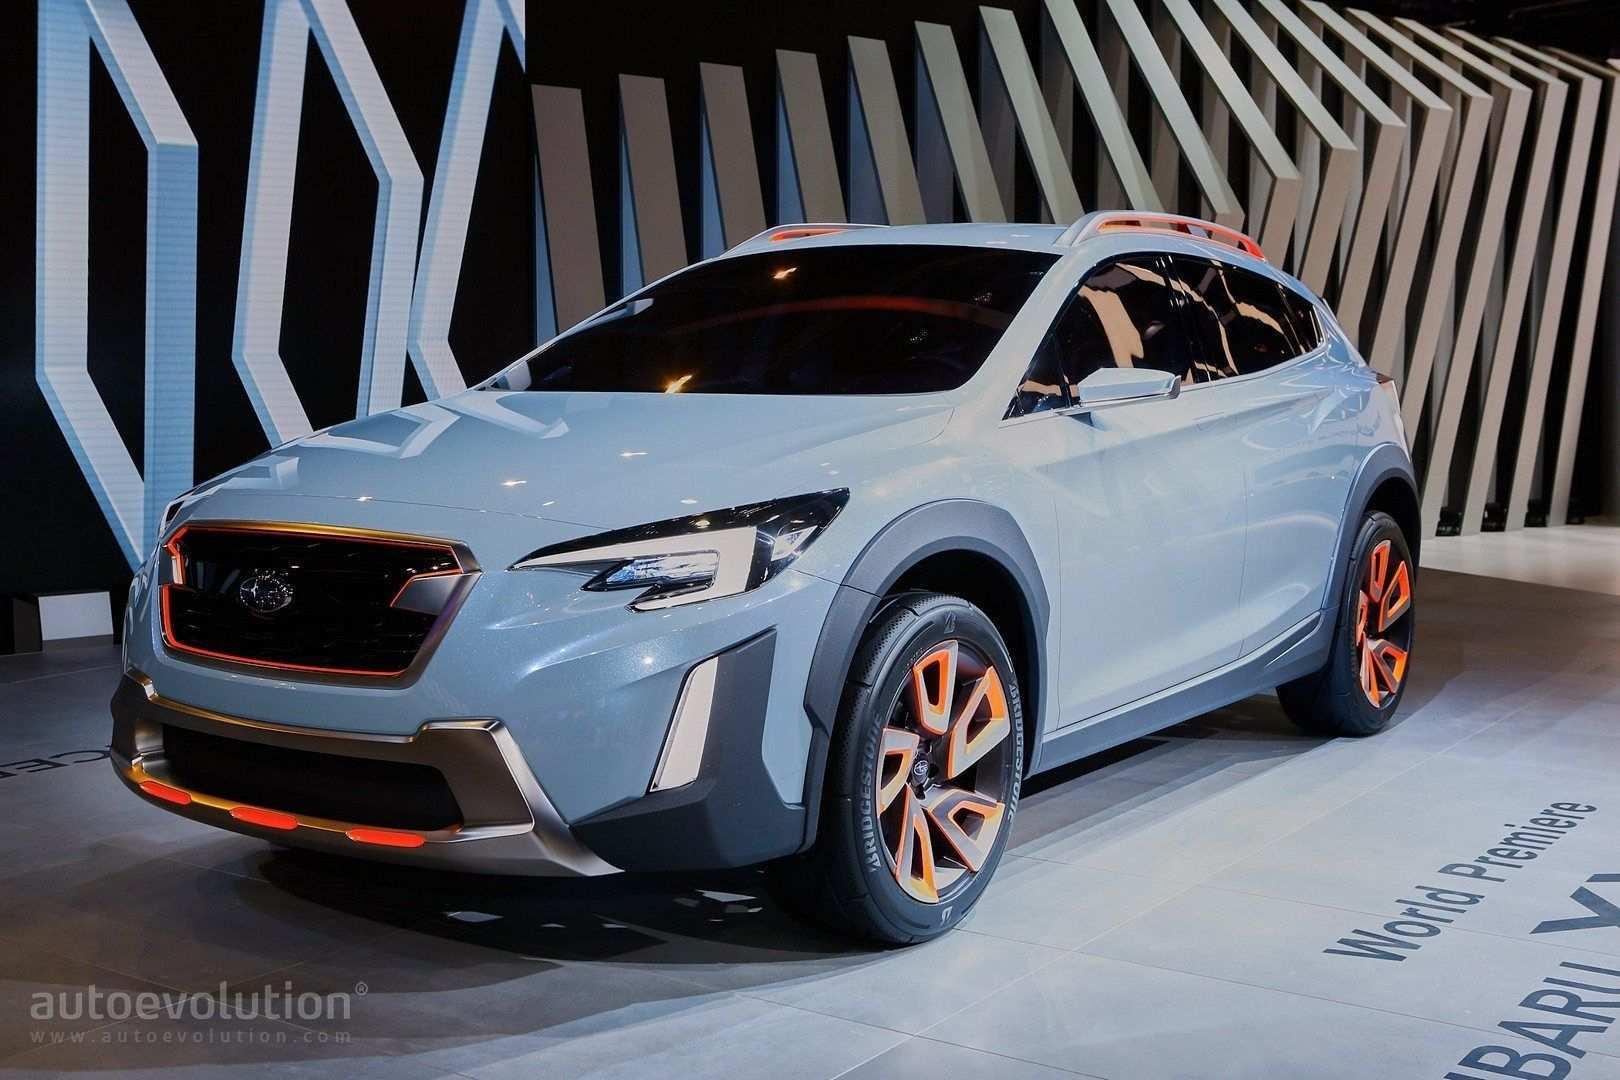 73 New Subaru 2020 Xv Release Date by Subaru 2020 Xv